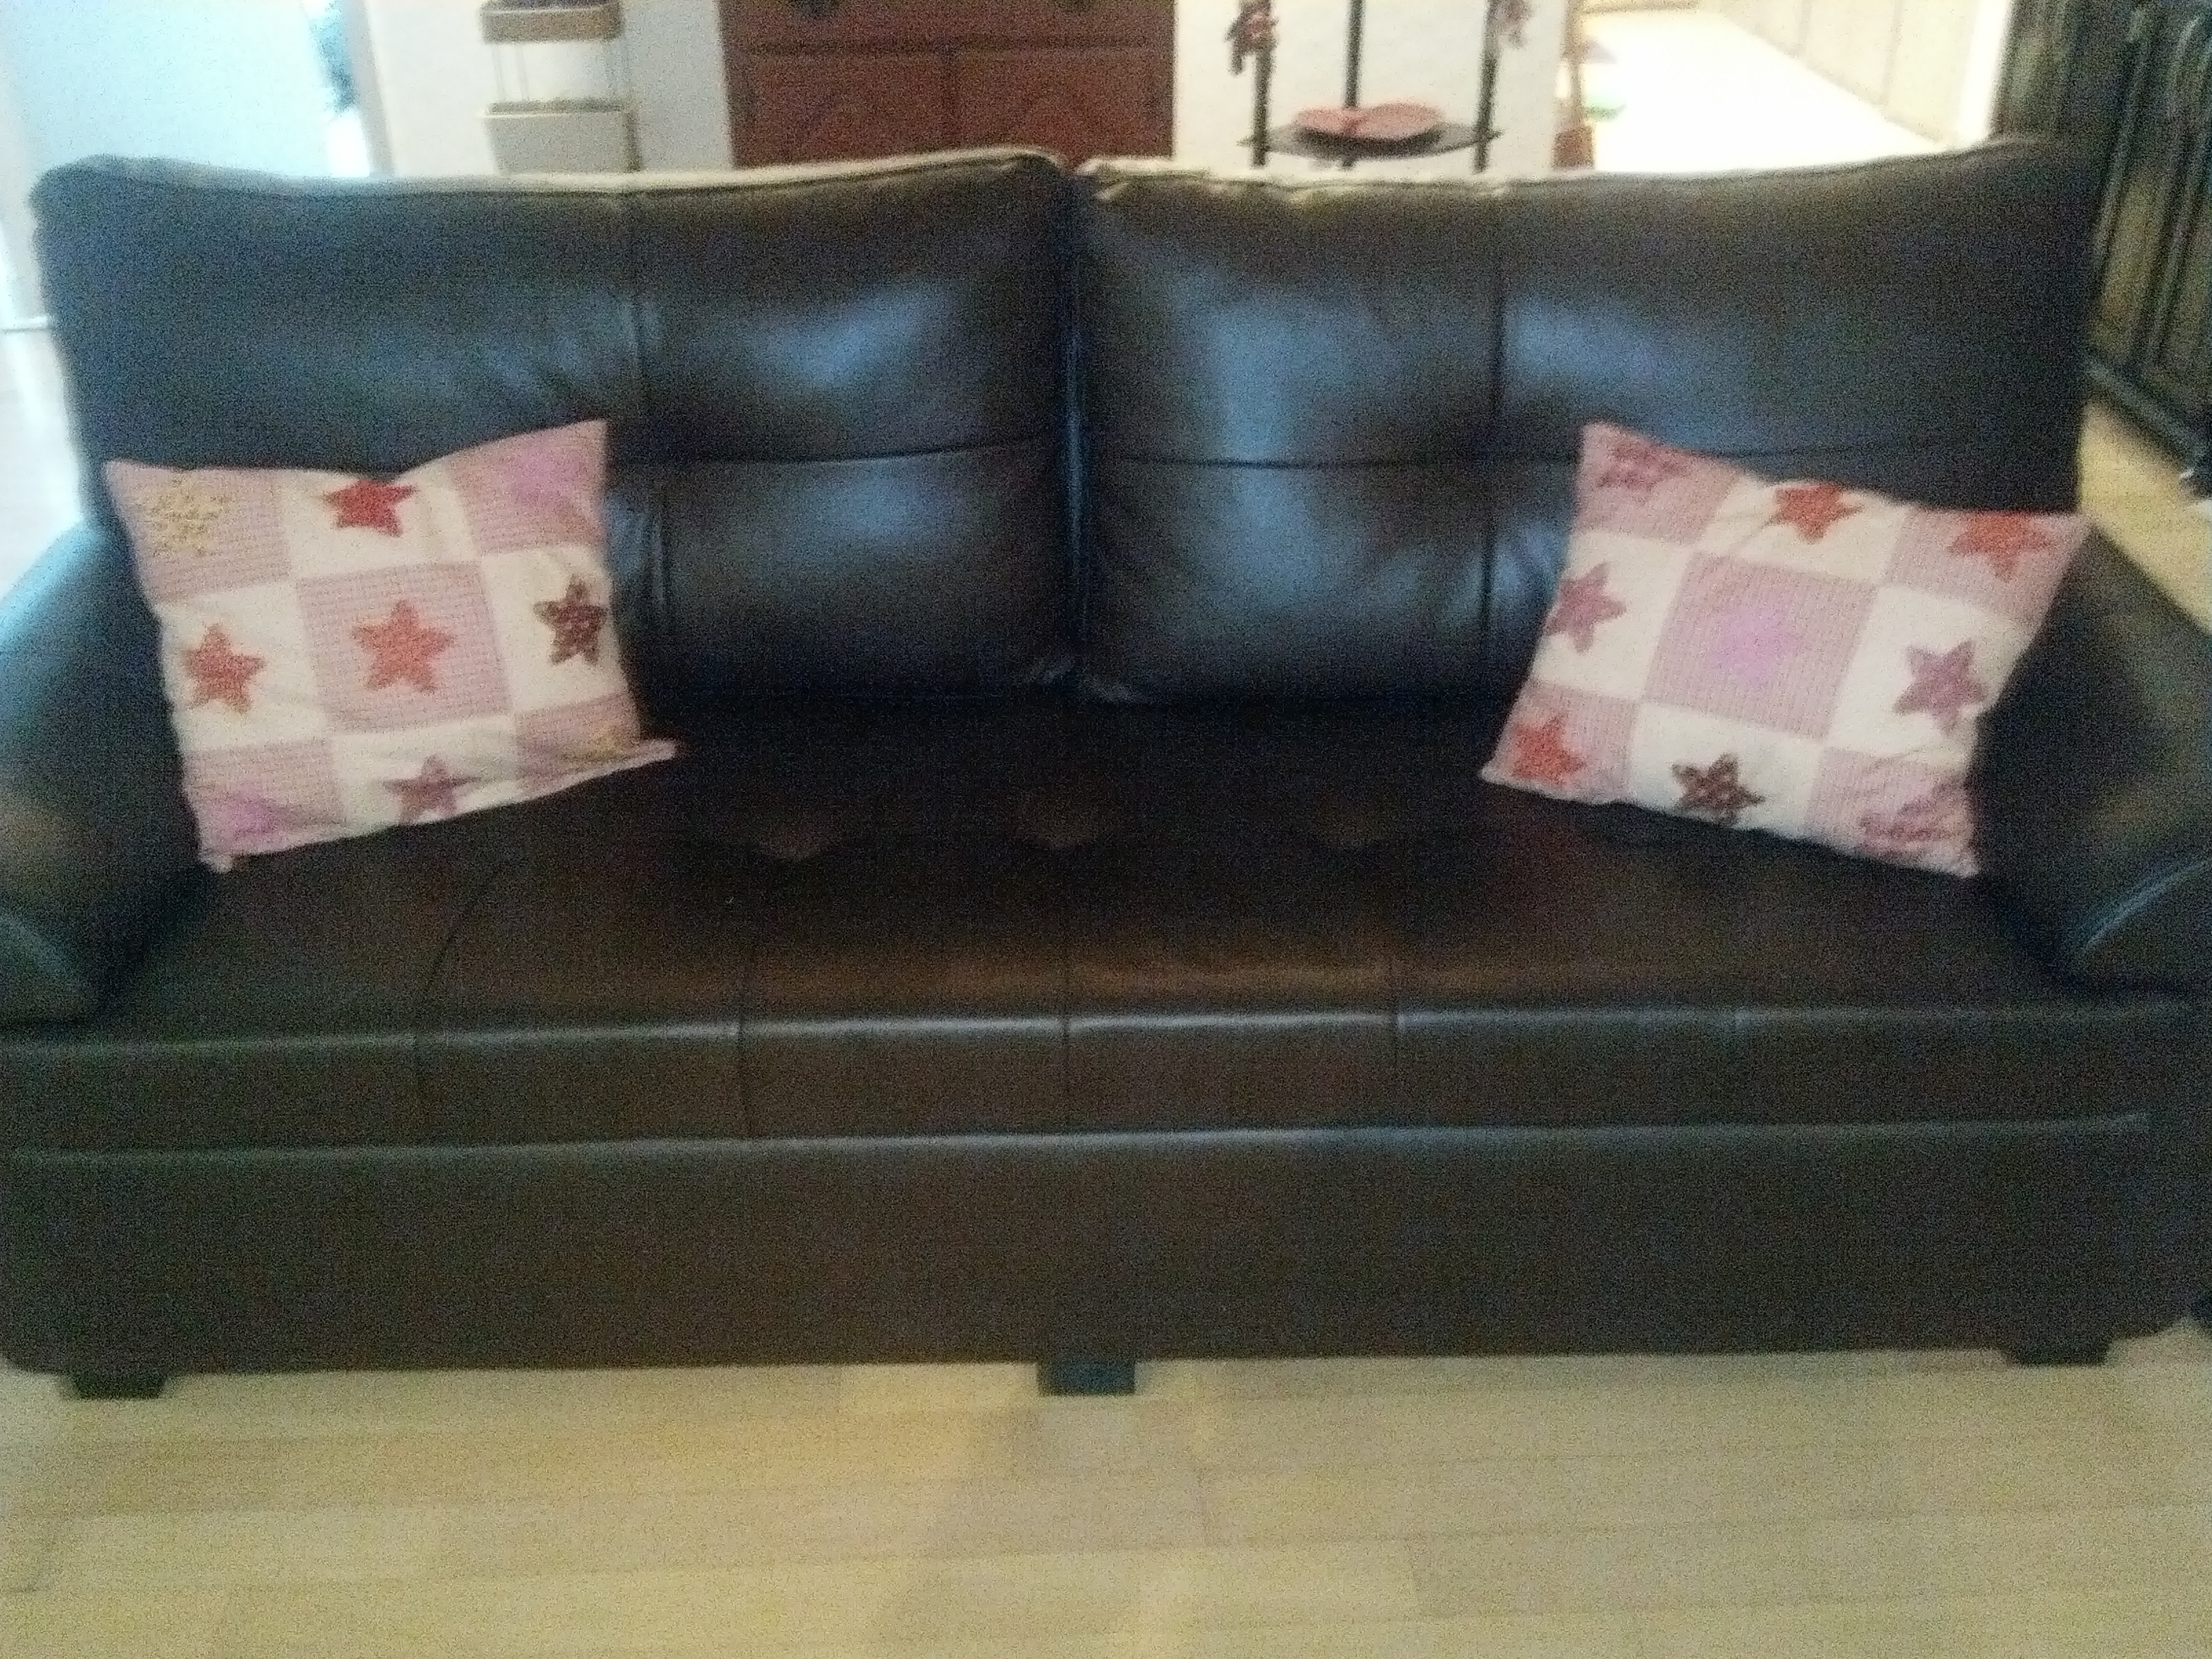 Uncomfortable sofa for Where to throw away furniture